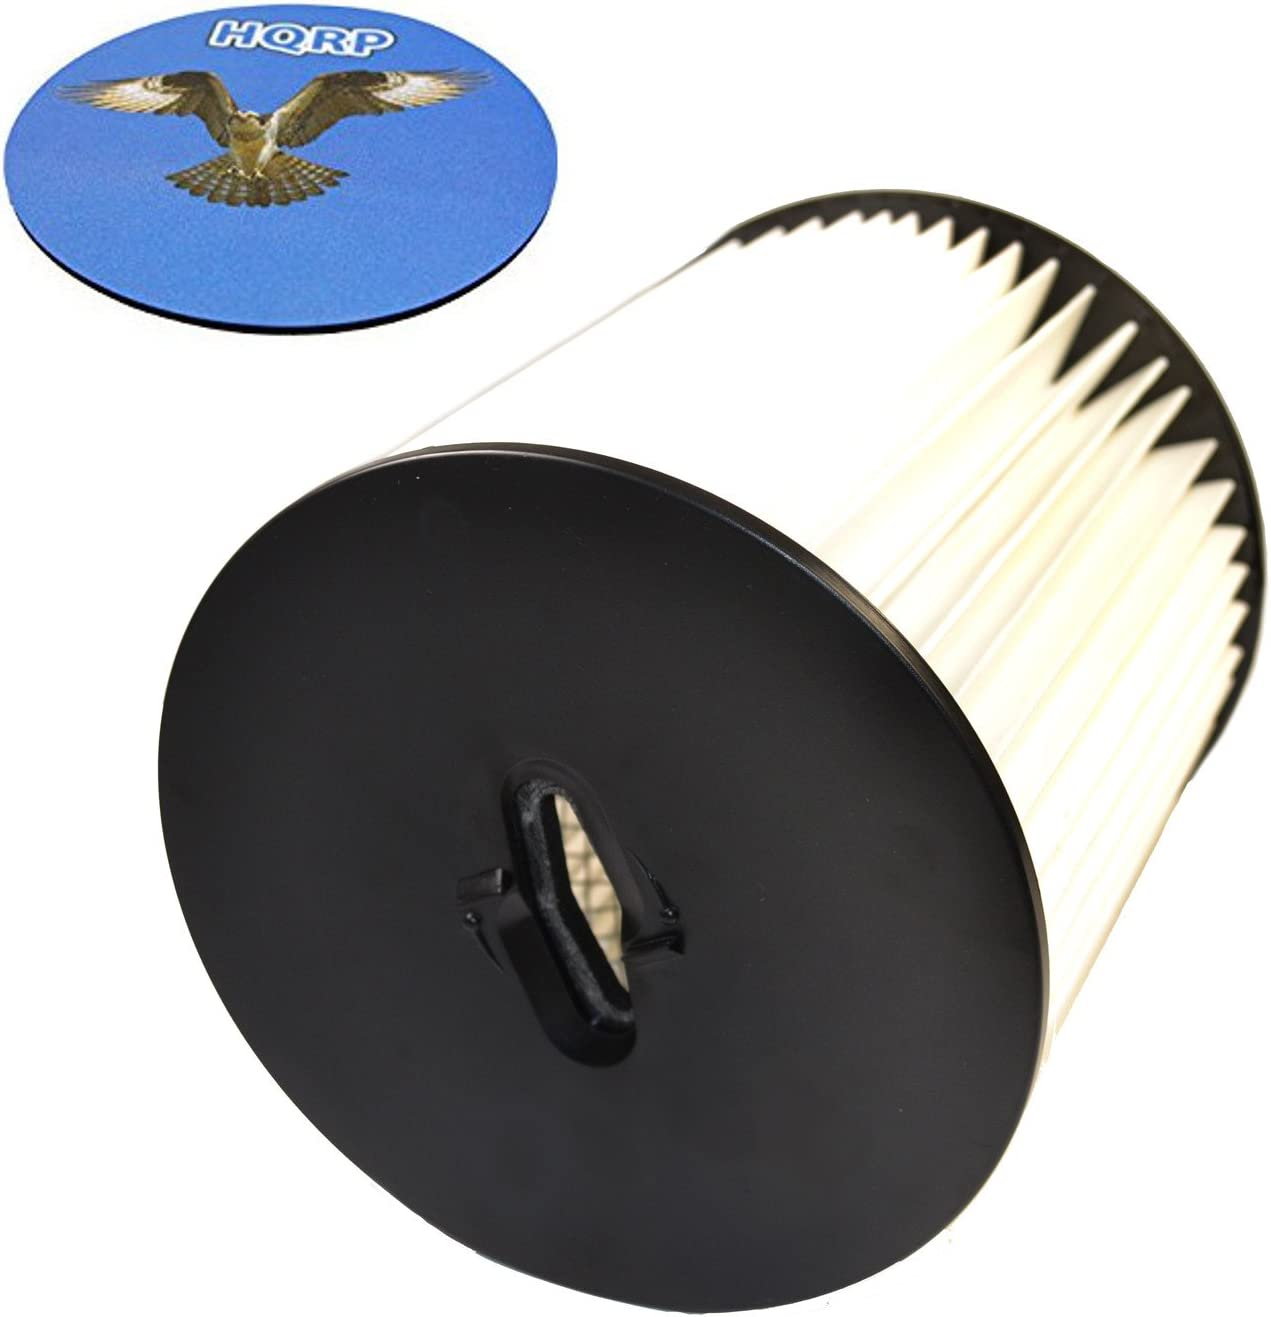 "HQRP 7"" Filter for Royal CS820, CS620, CS600, CS400, CS800 H-P Central Vacuum Systems, 8106-01 Replacement Coaster"